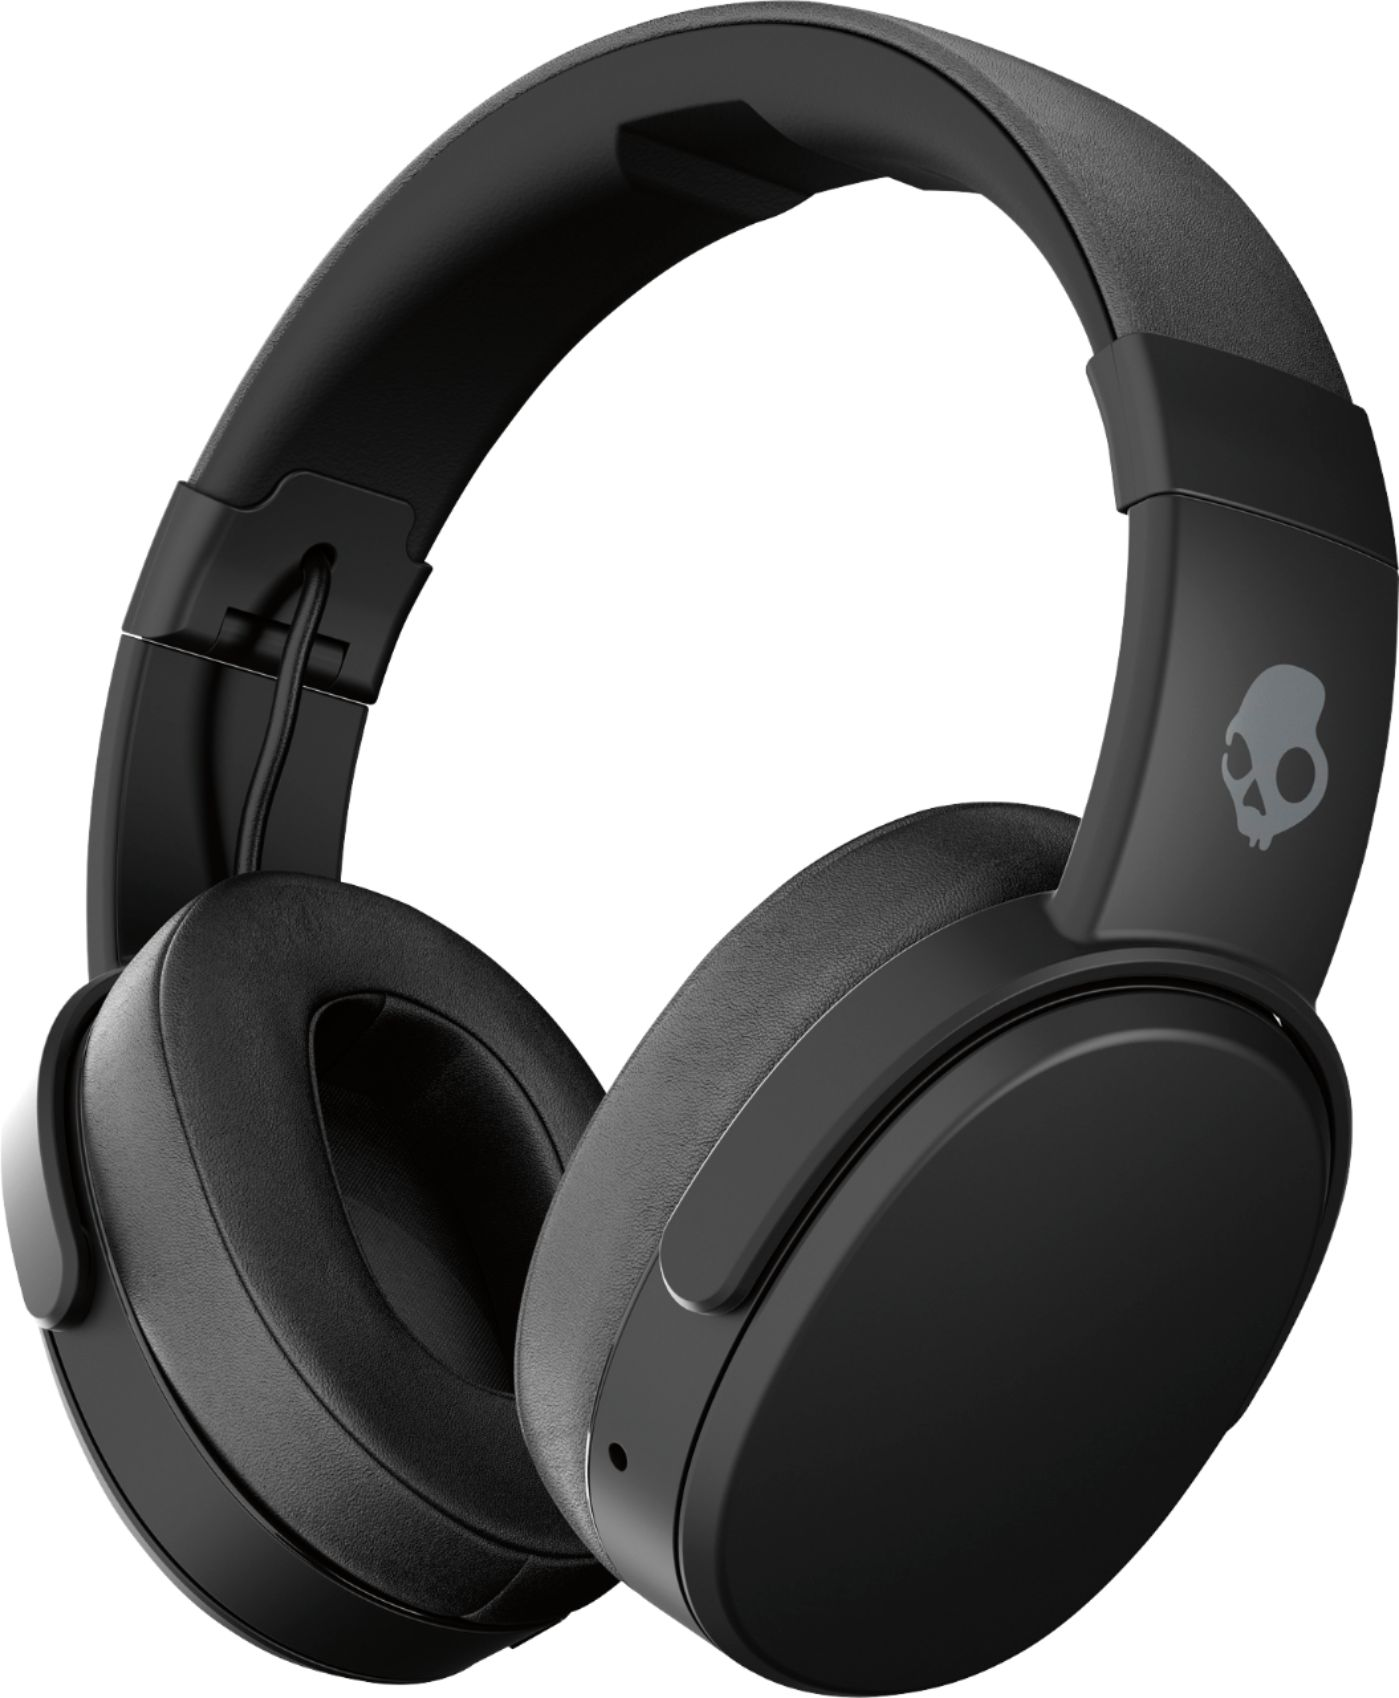 hight resolution of skullcandy crusher wireless over the ear headphones black coral s6crw k591 best buy